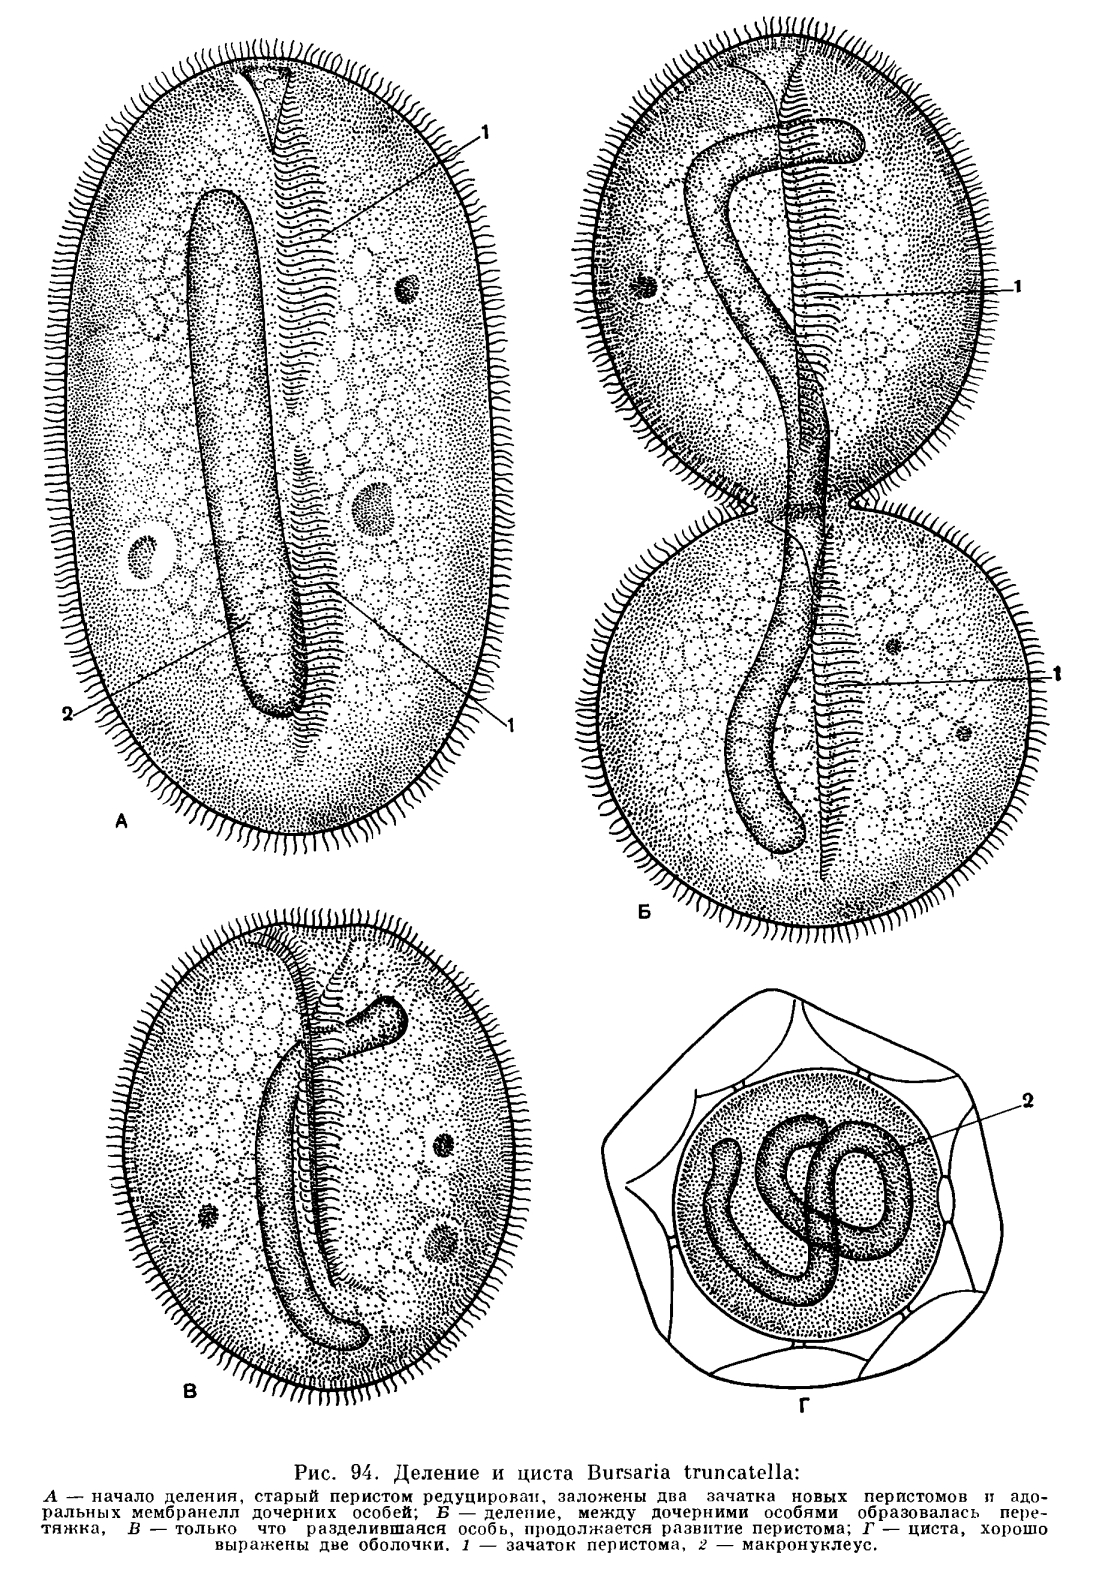 паразиты человека доклад